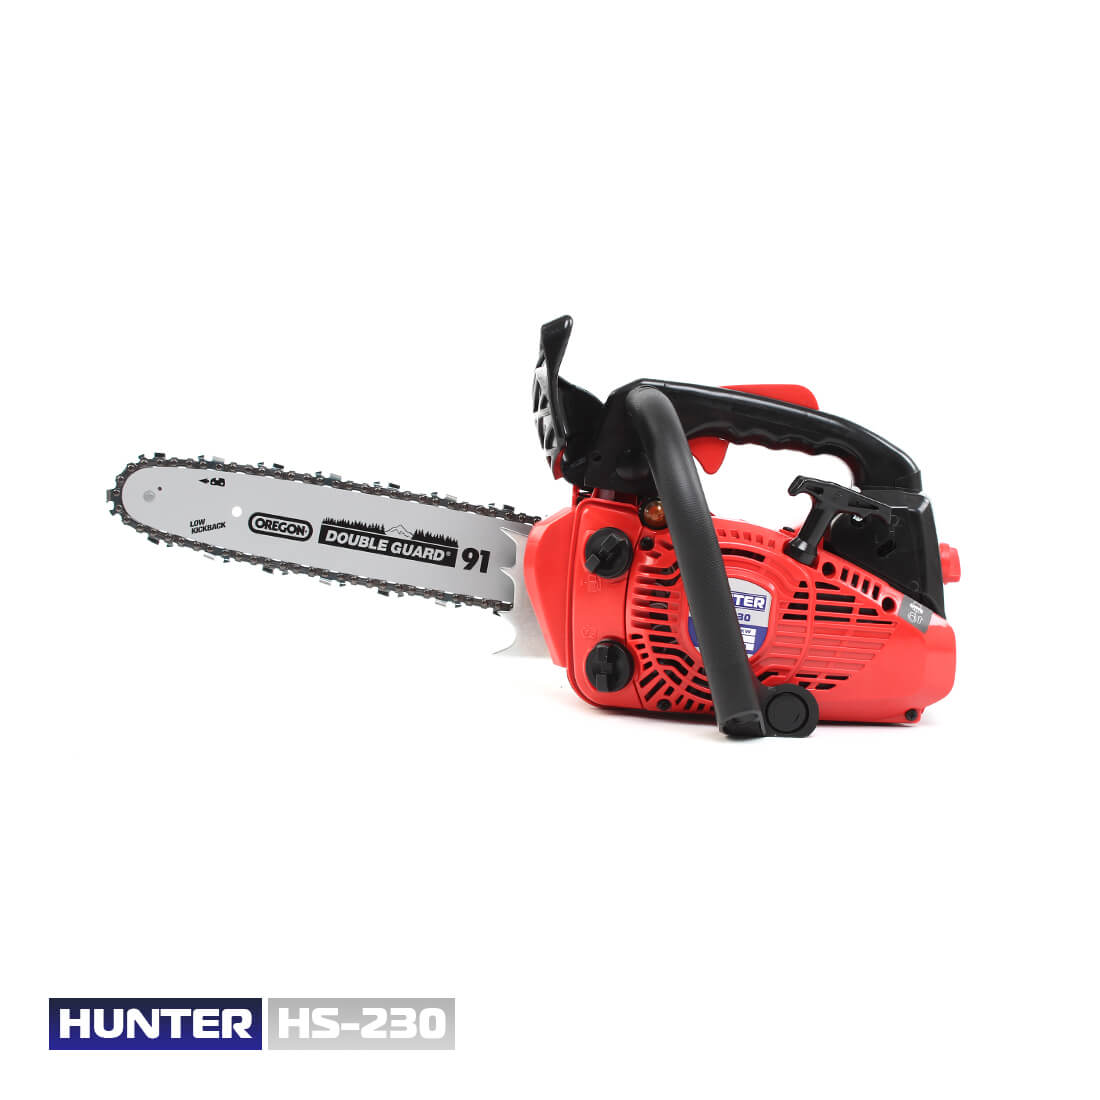 Фото Hunter HS-230 цена 3470грн №3 — Hunter